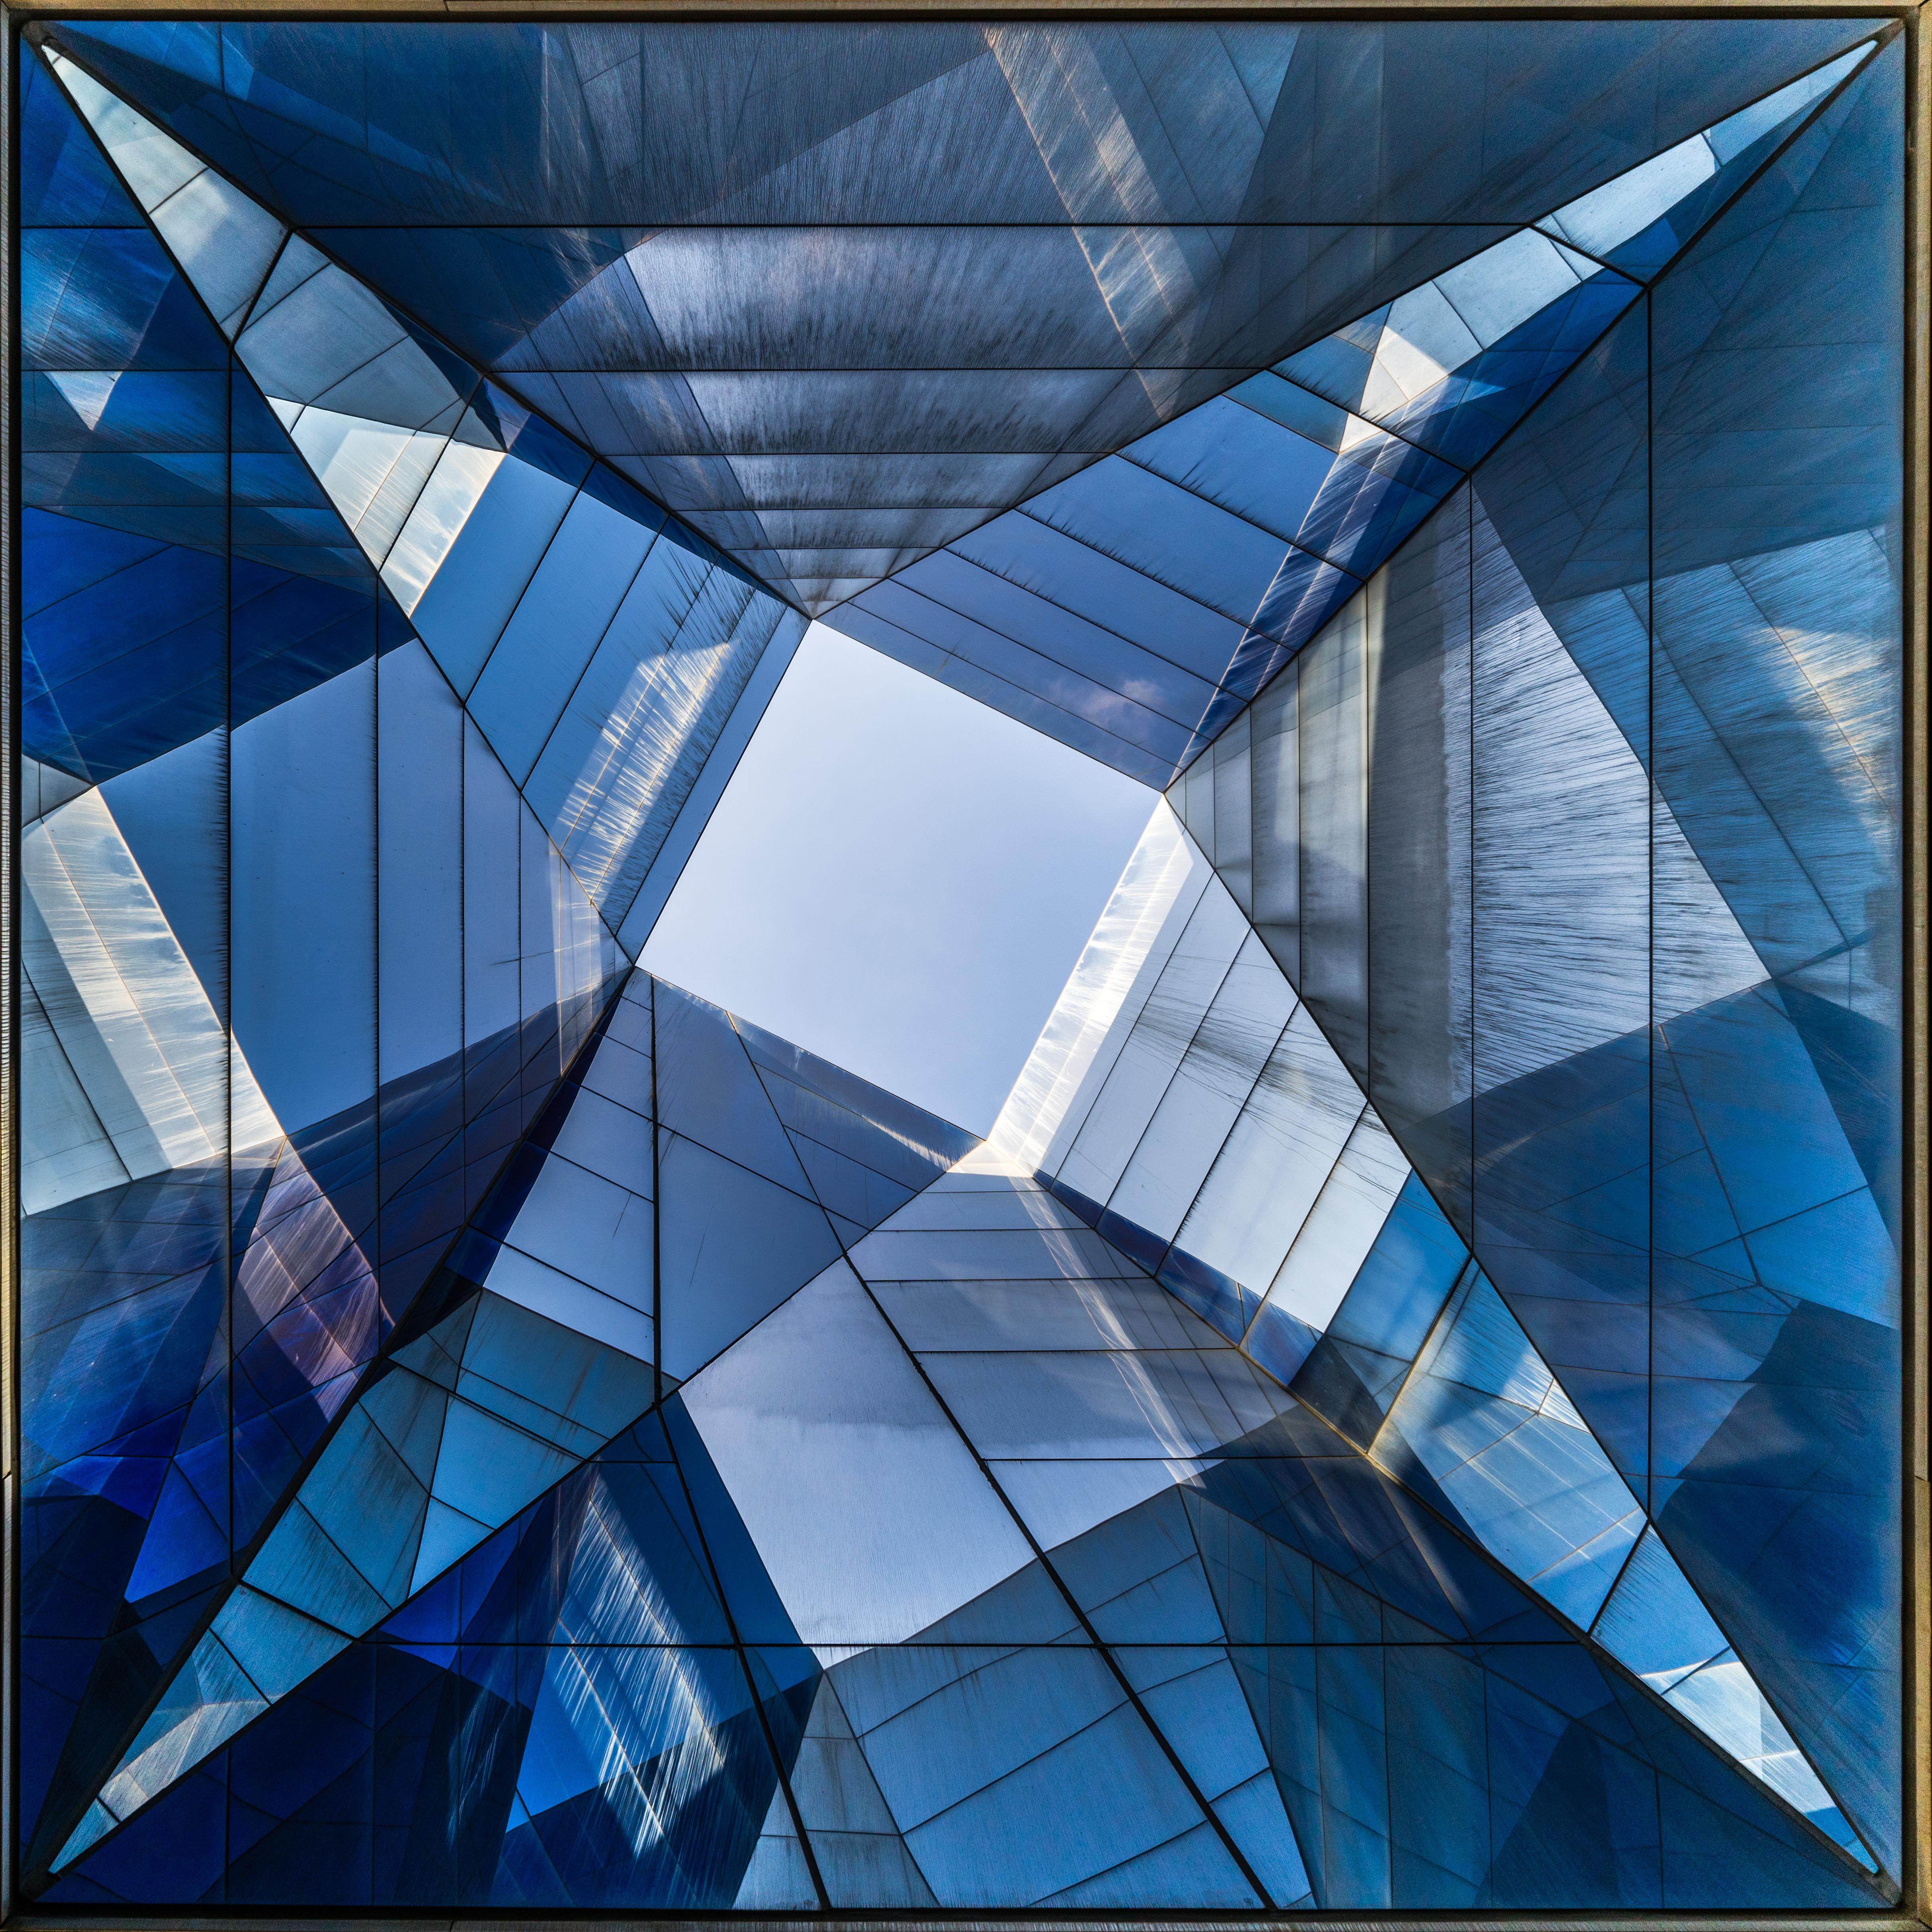 Blue skylight